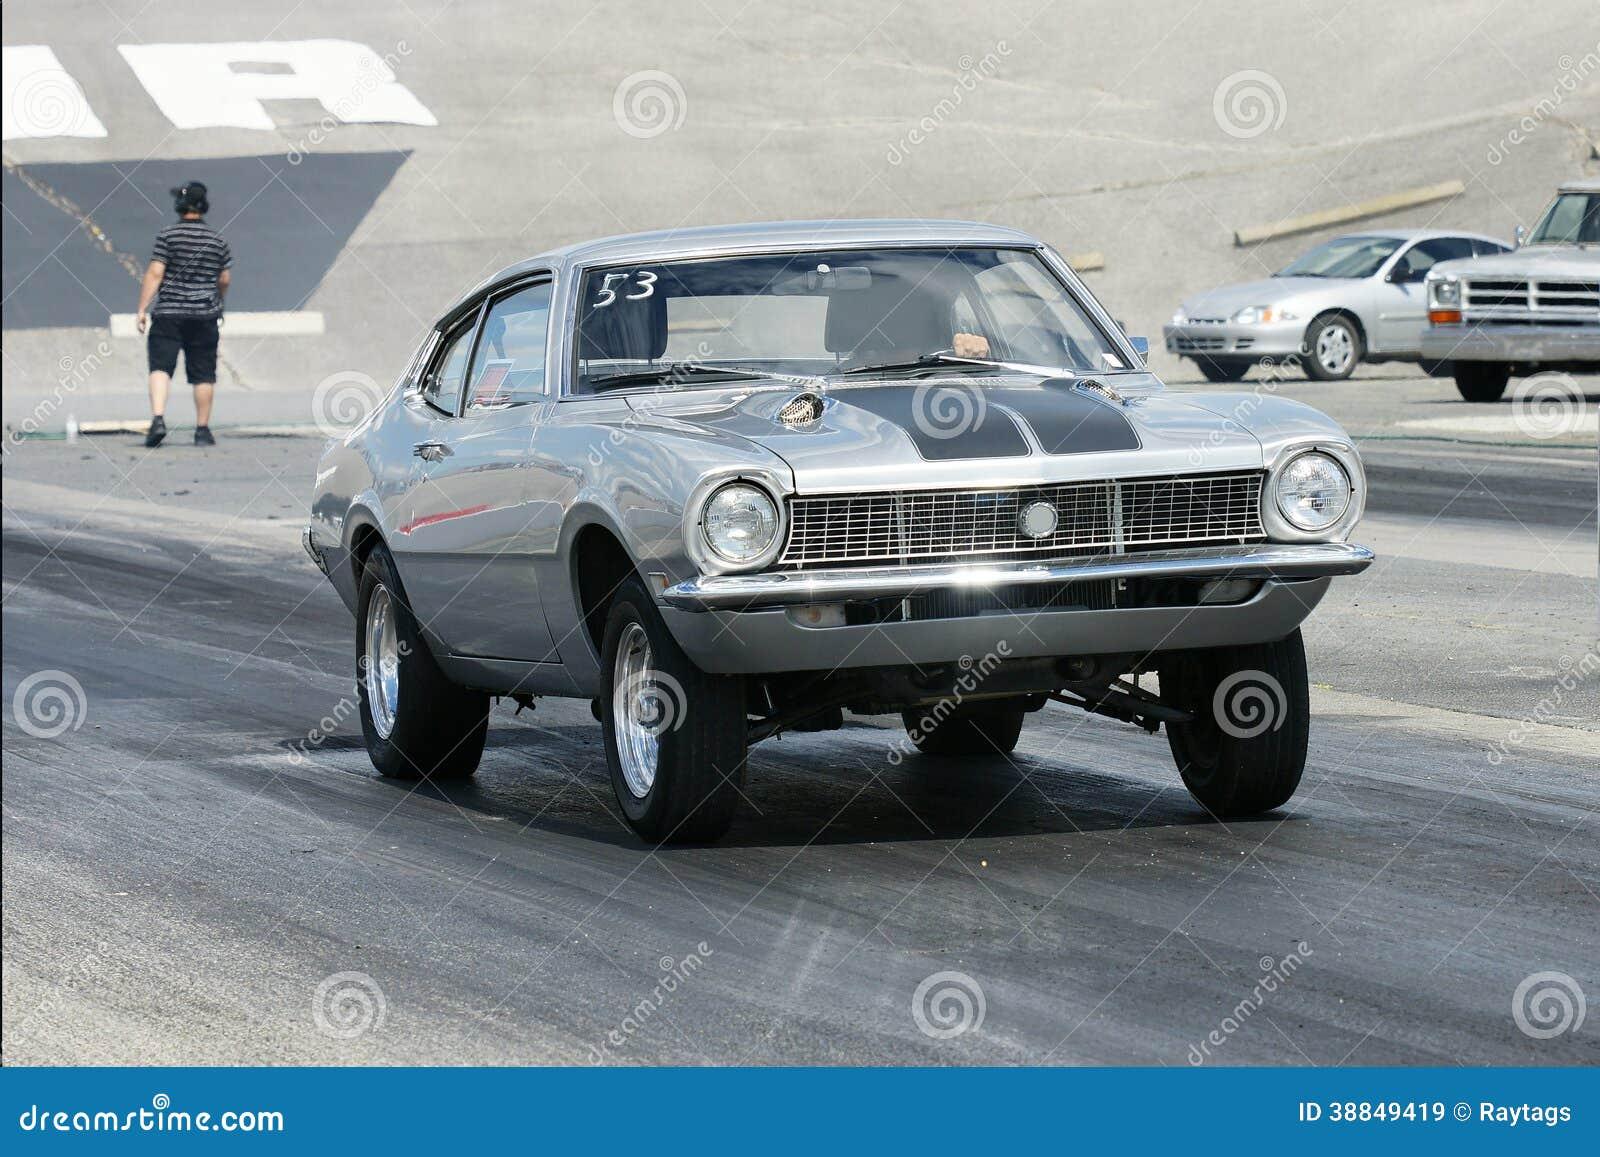 Drag car start